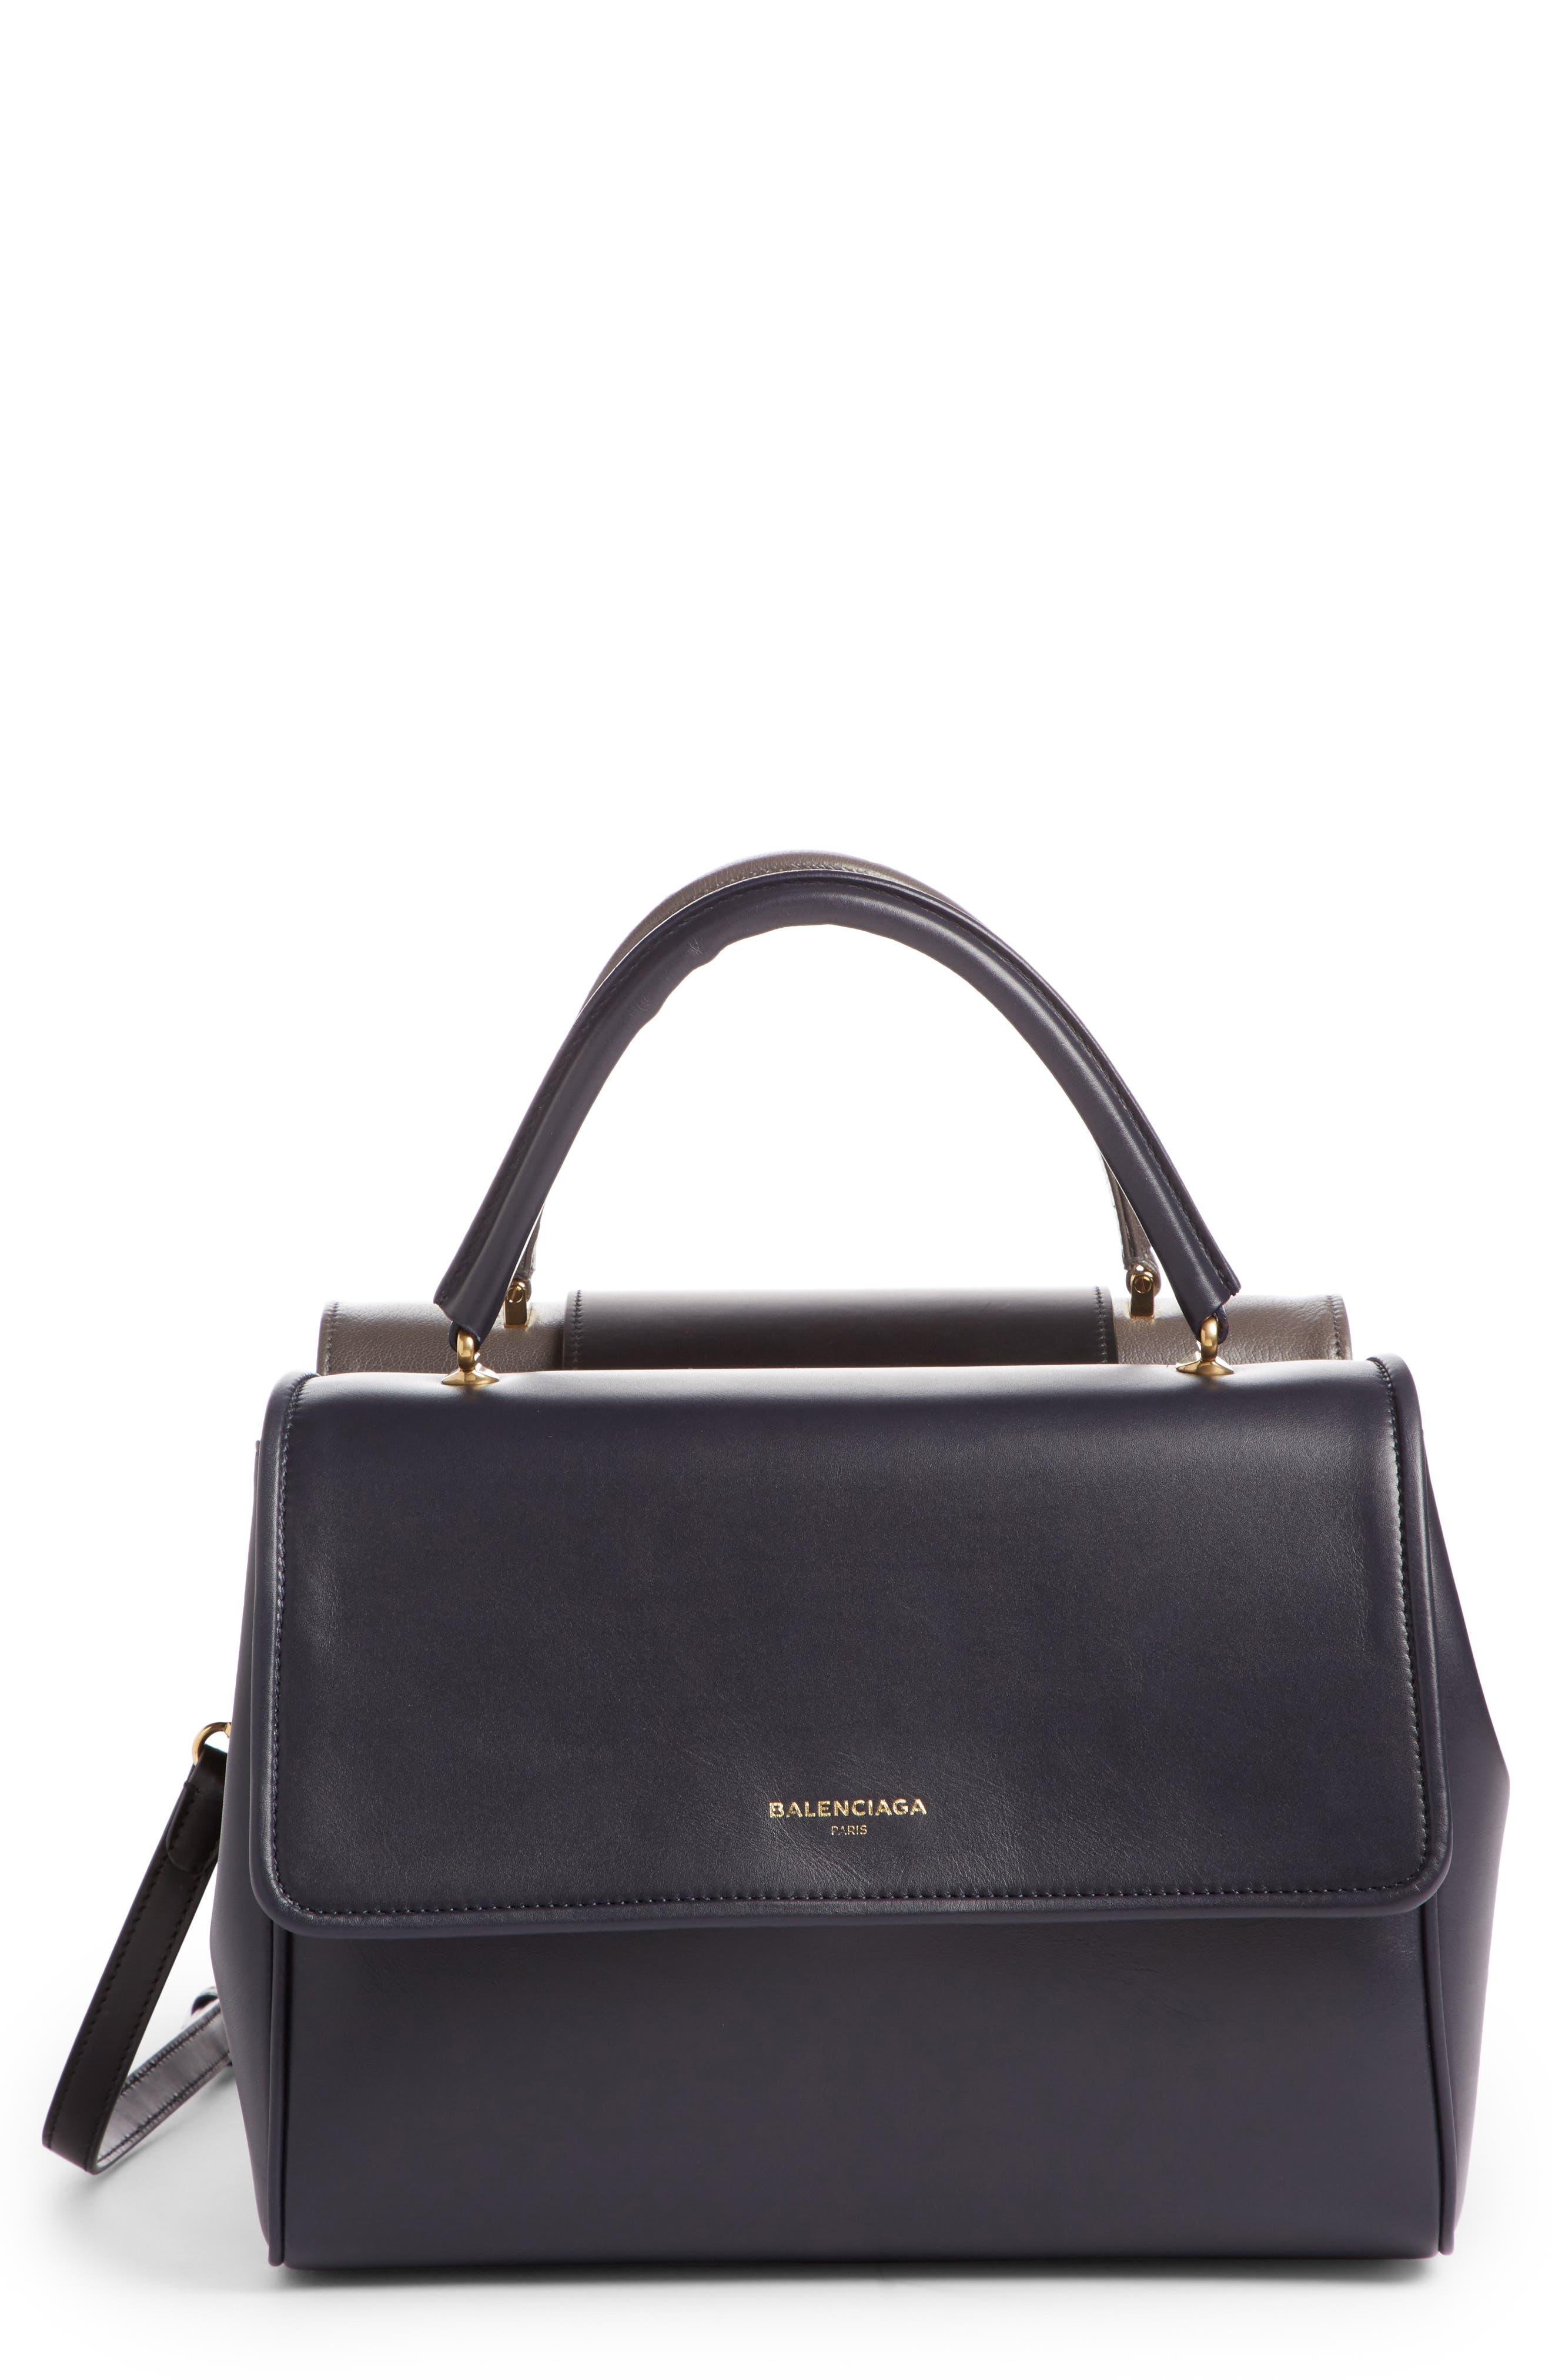 Balenciaga Collage Triple Leather Bag